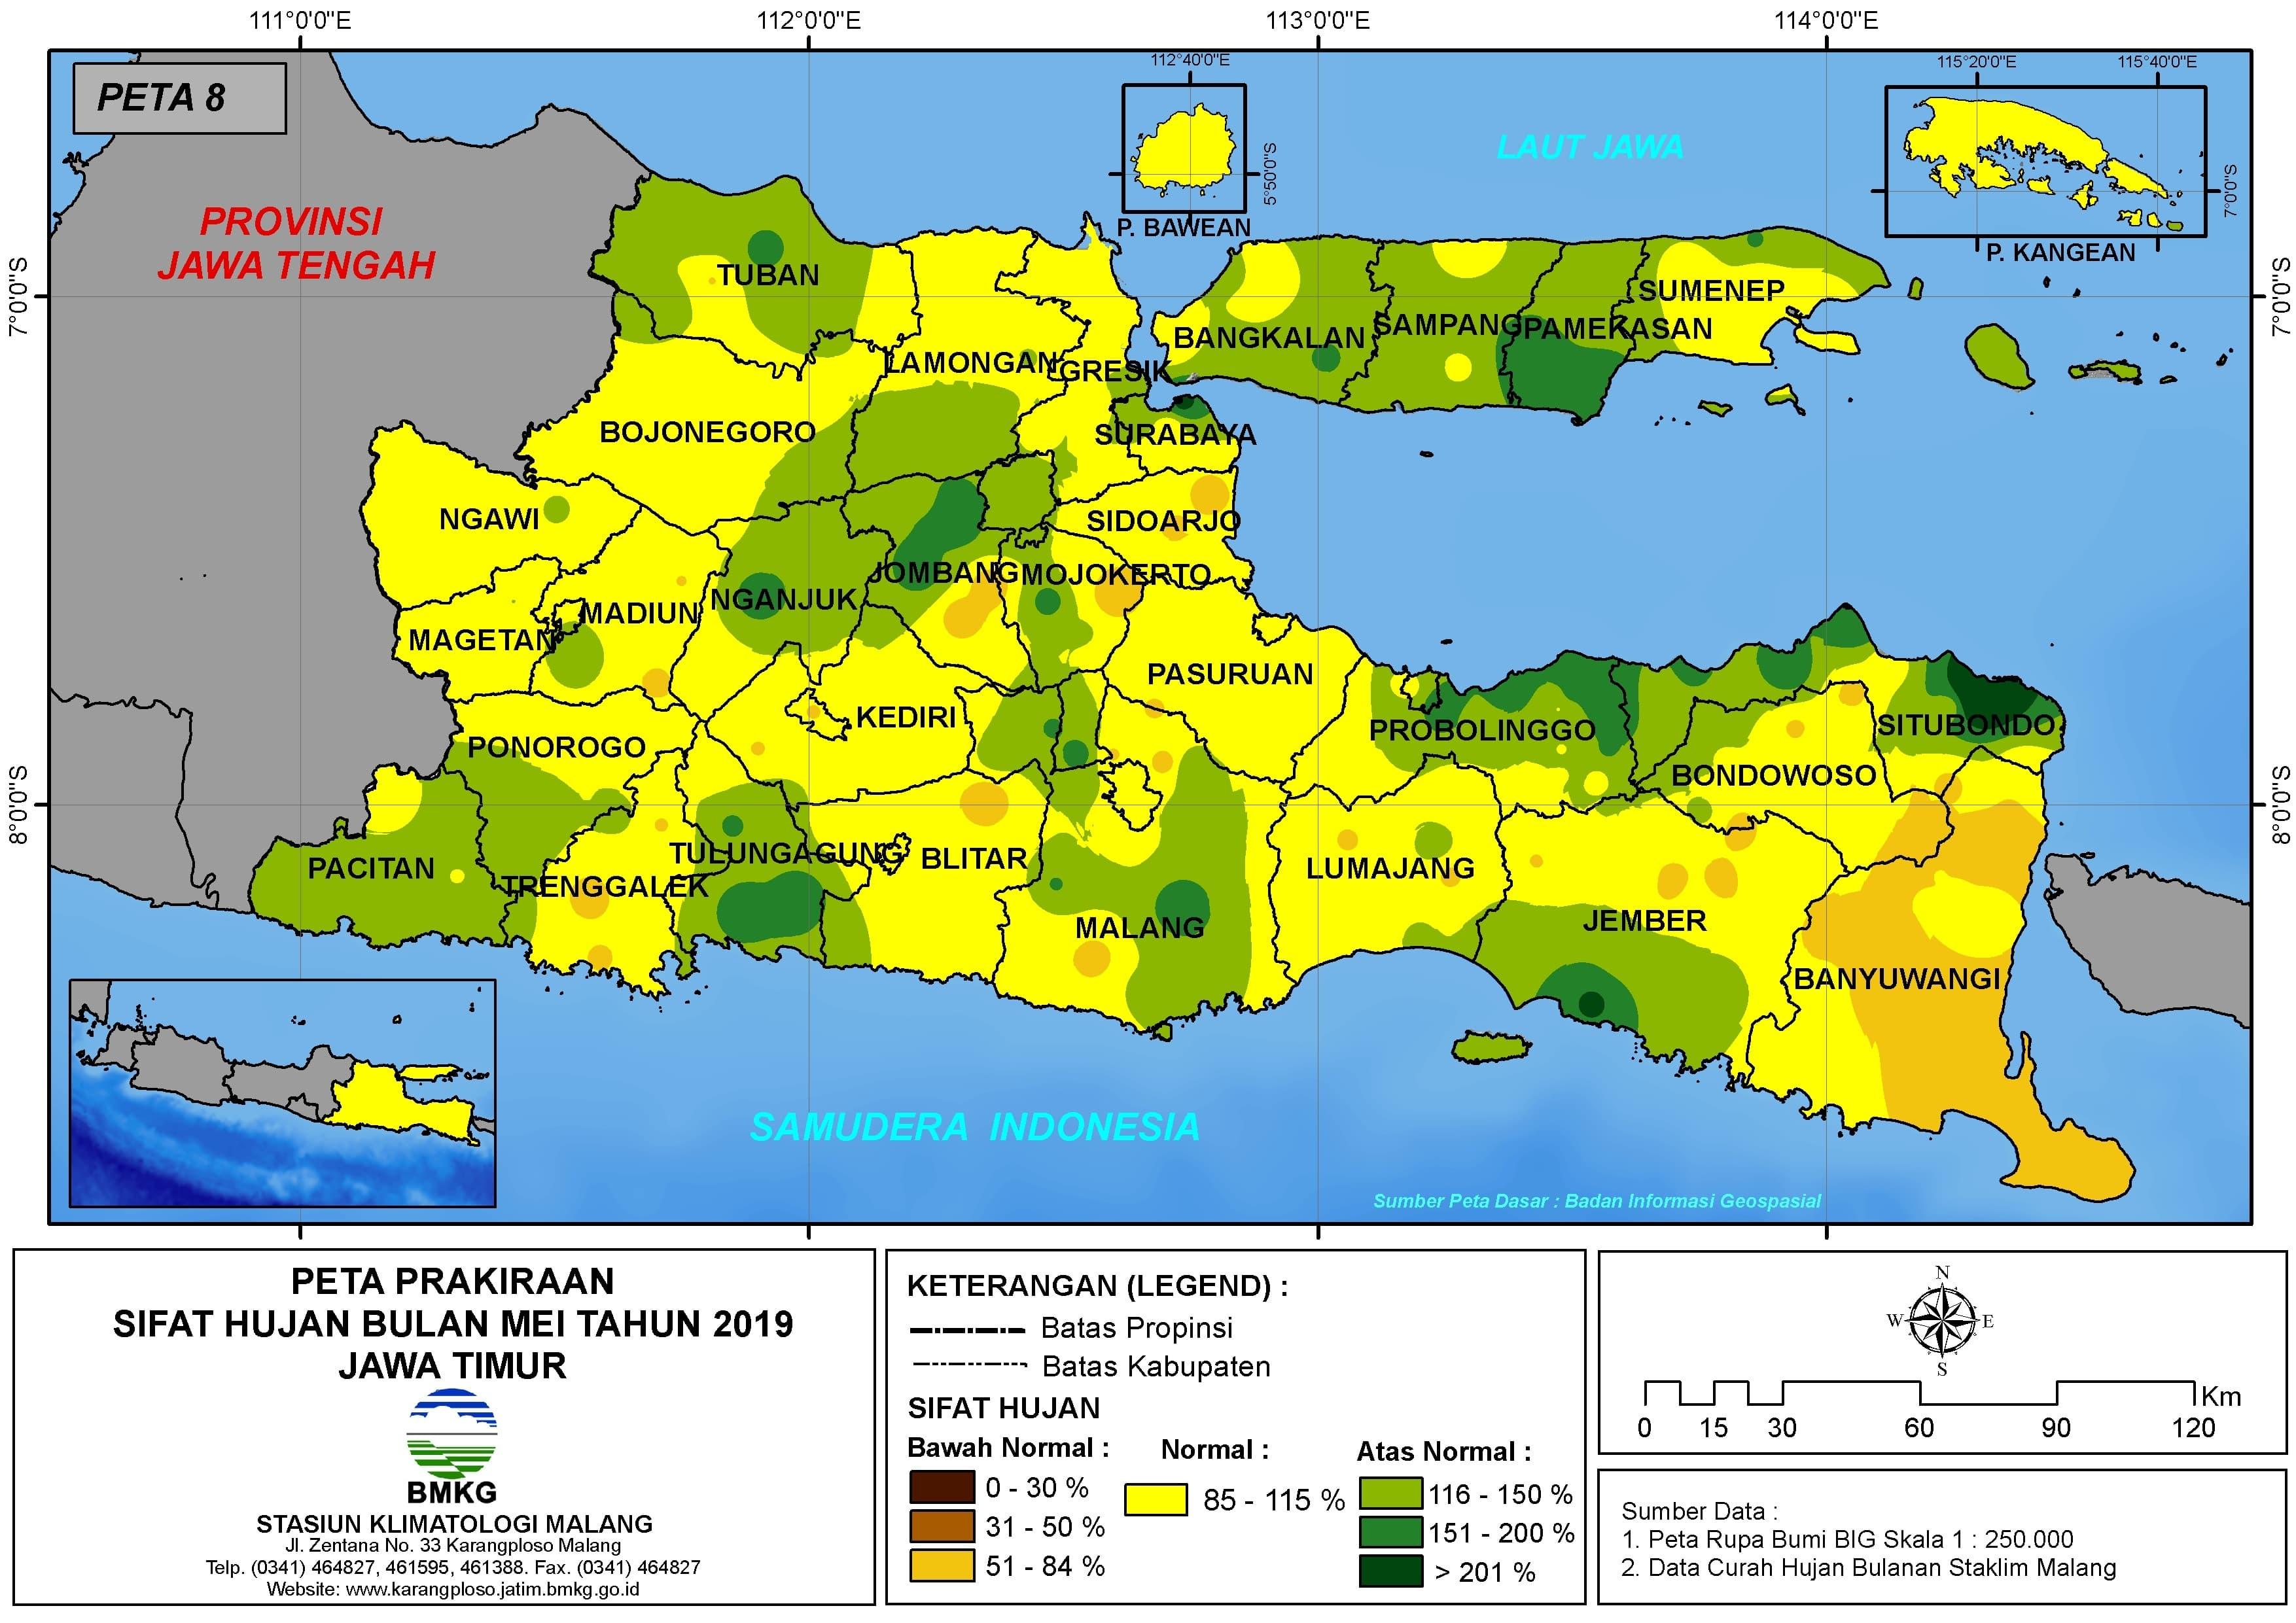 Prakiraan Sifat Hujan Bulan Mei Tahun 2019 di Provinsi Jawa Timur Update dari Analisis Bulan Januari 2019